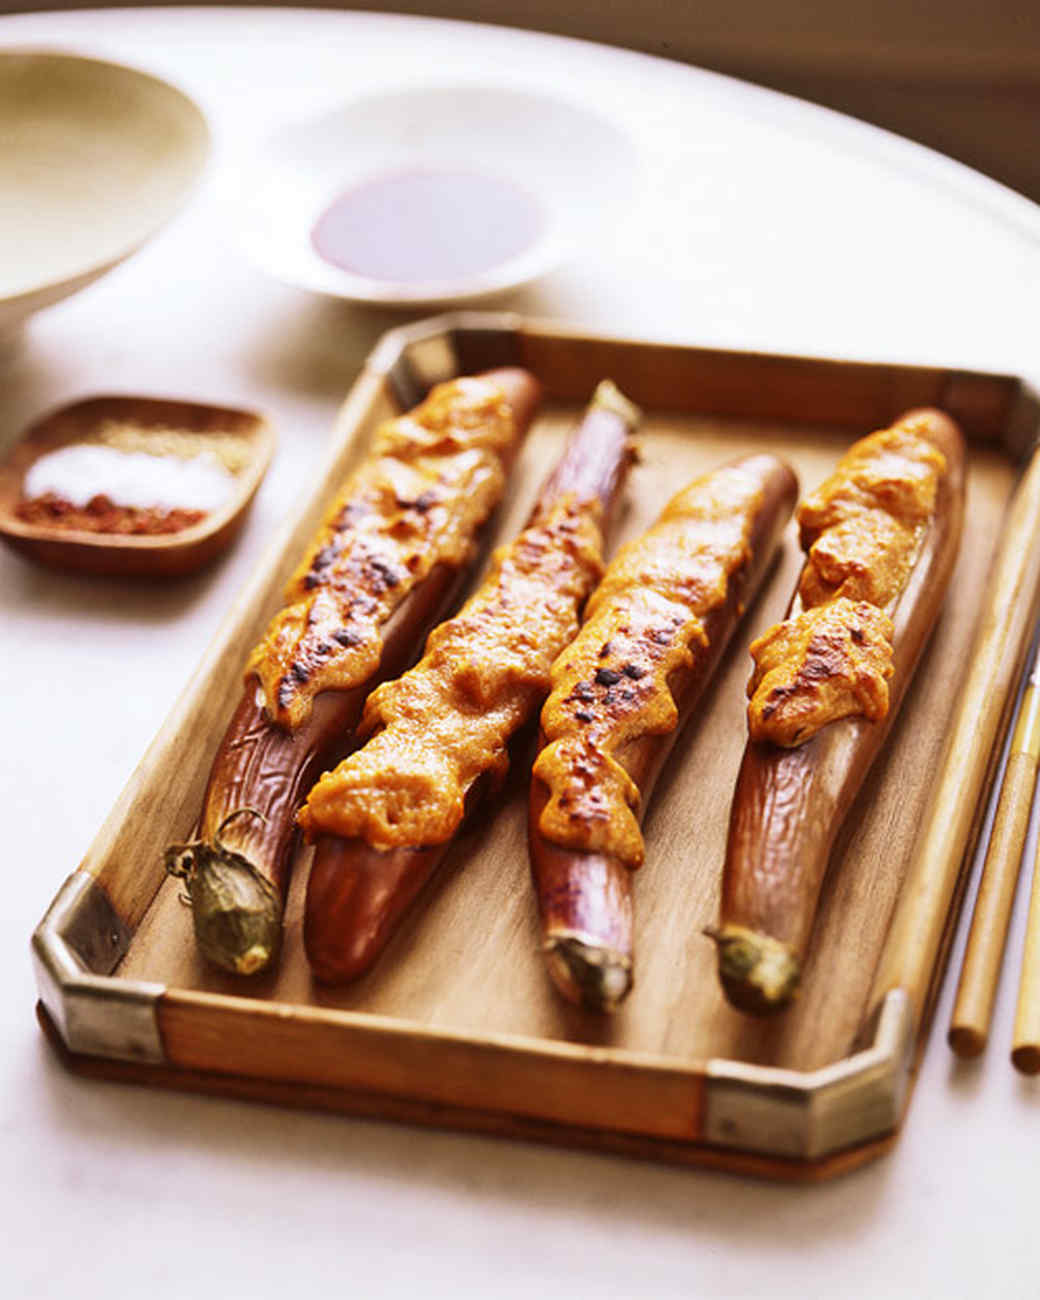 Miso-Stuffed Eggplant